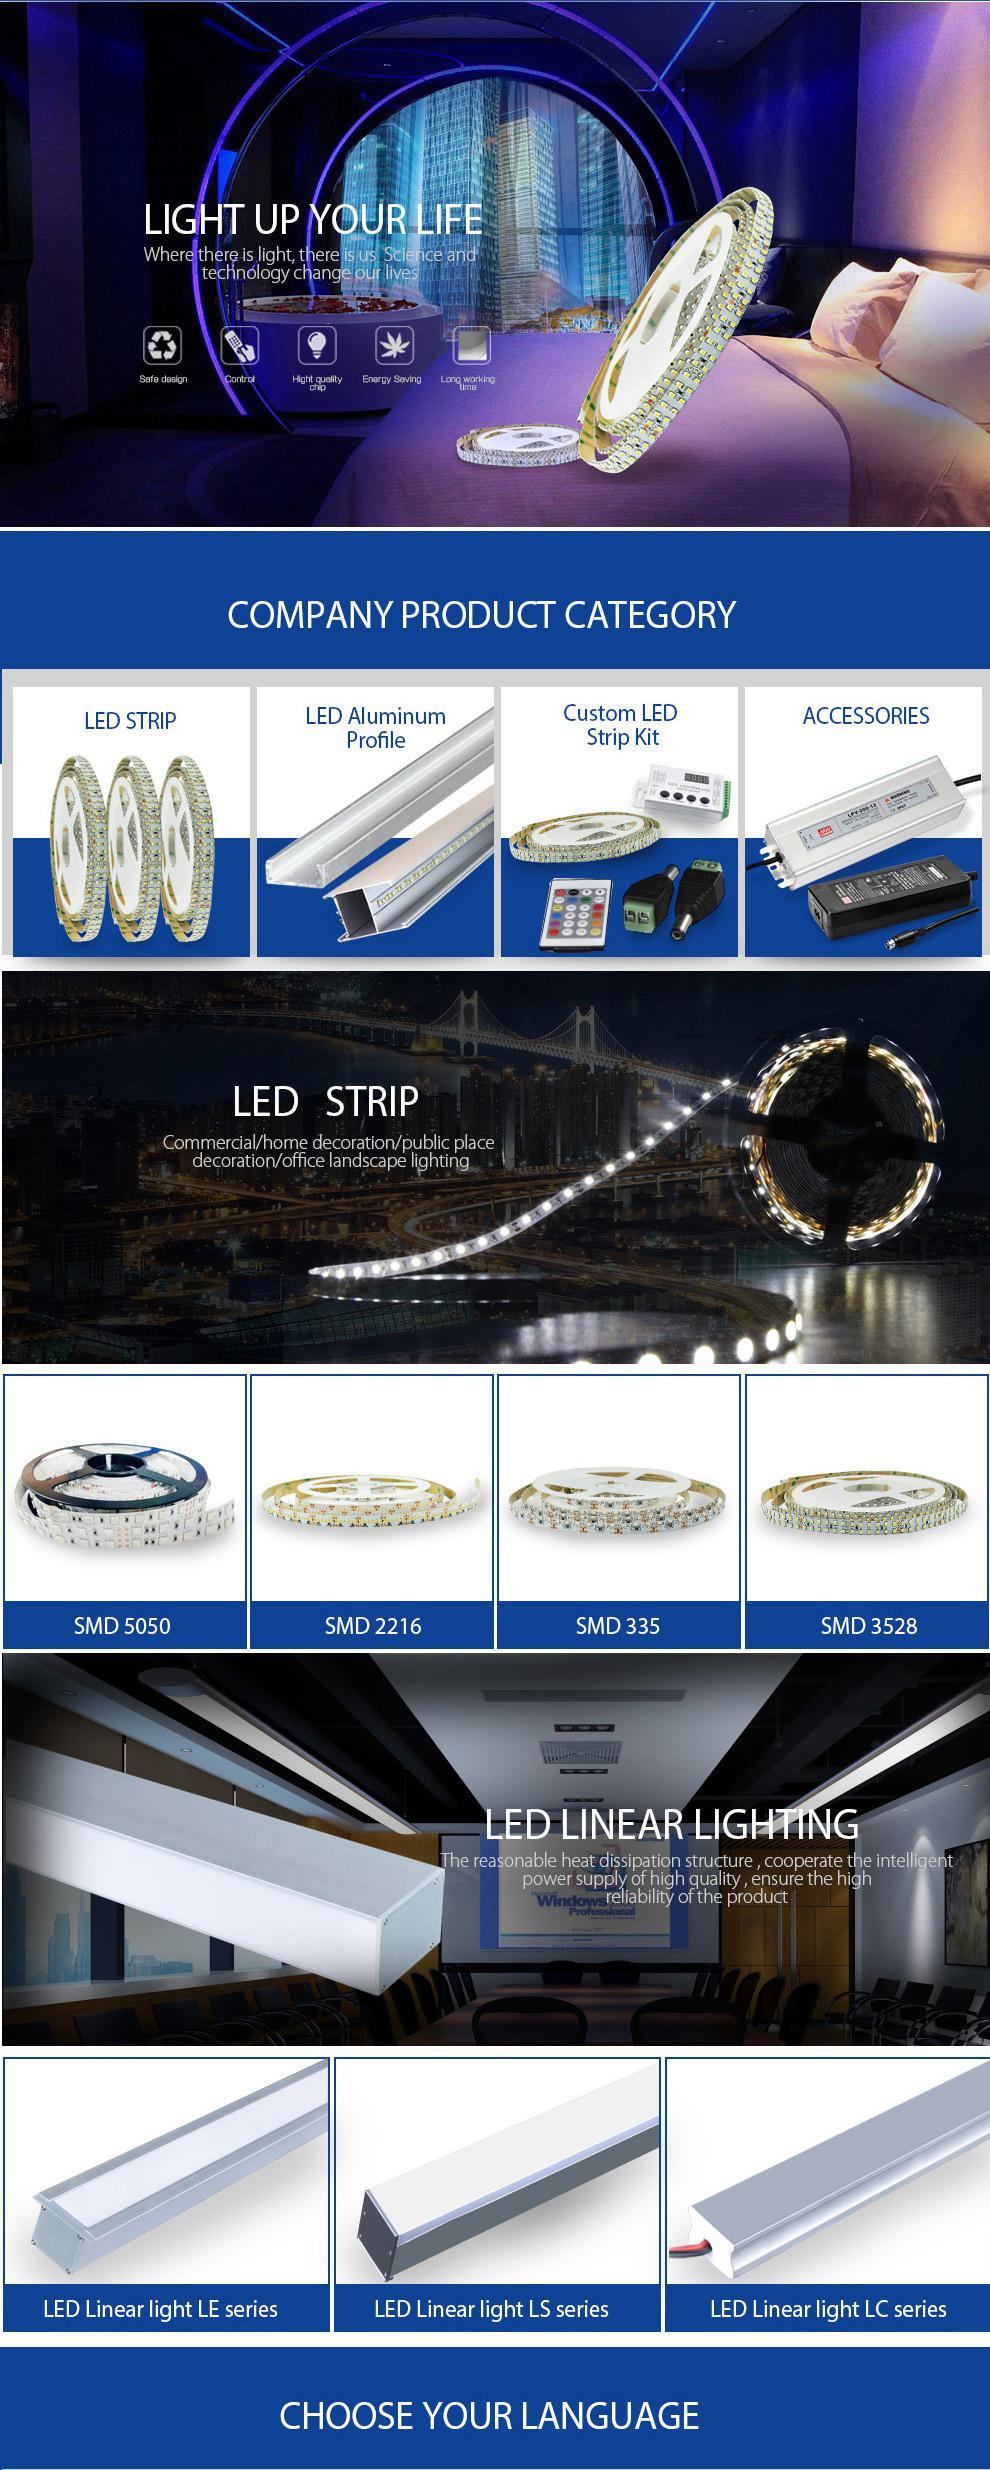 HTB1Hg6SRpXXXXbIapXXq6xXFXXXy Fabelhafte Led Flex Lichtleisten Set Dekorationen